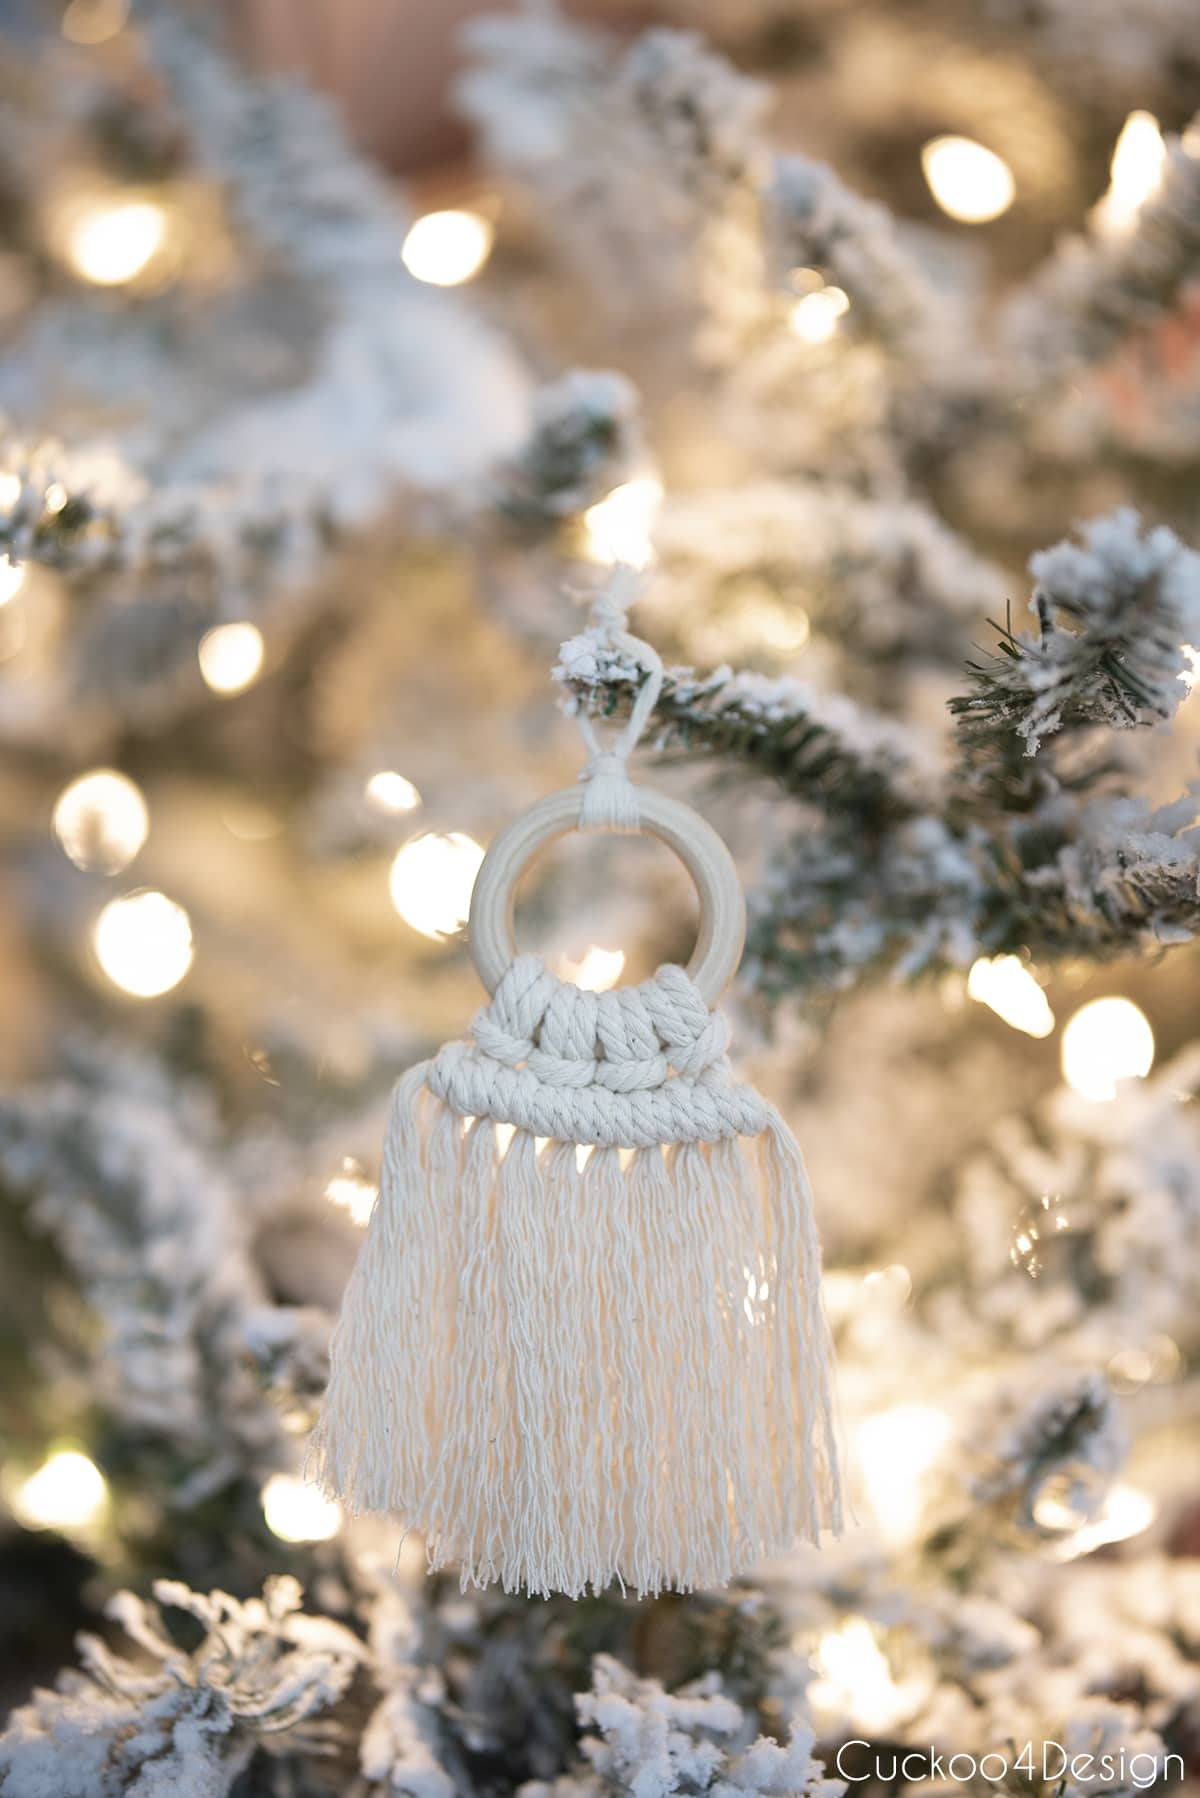 DIY macrame ornament hanging in Christmas tree